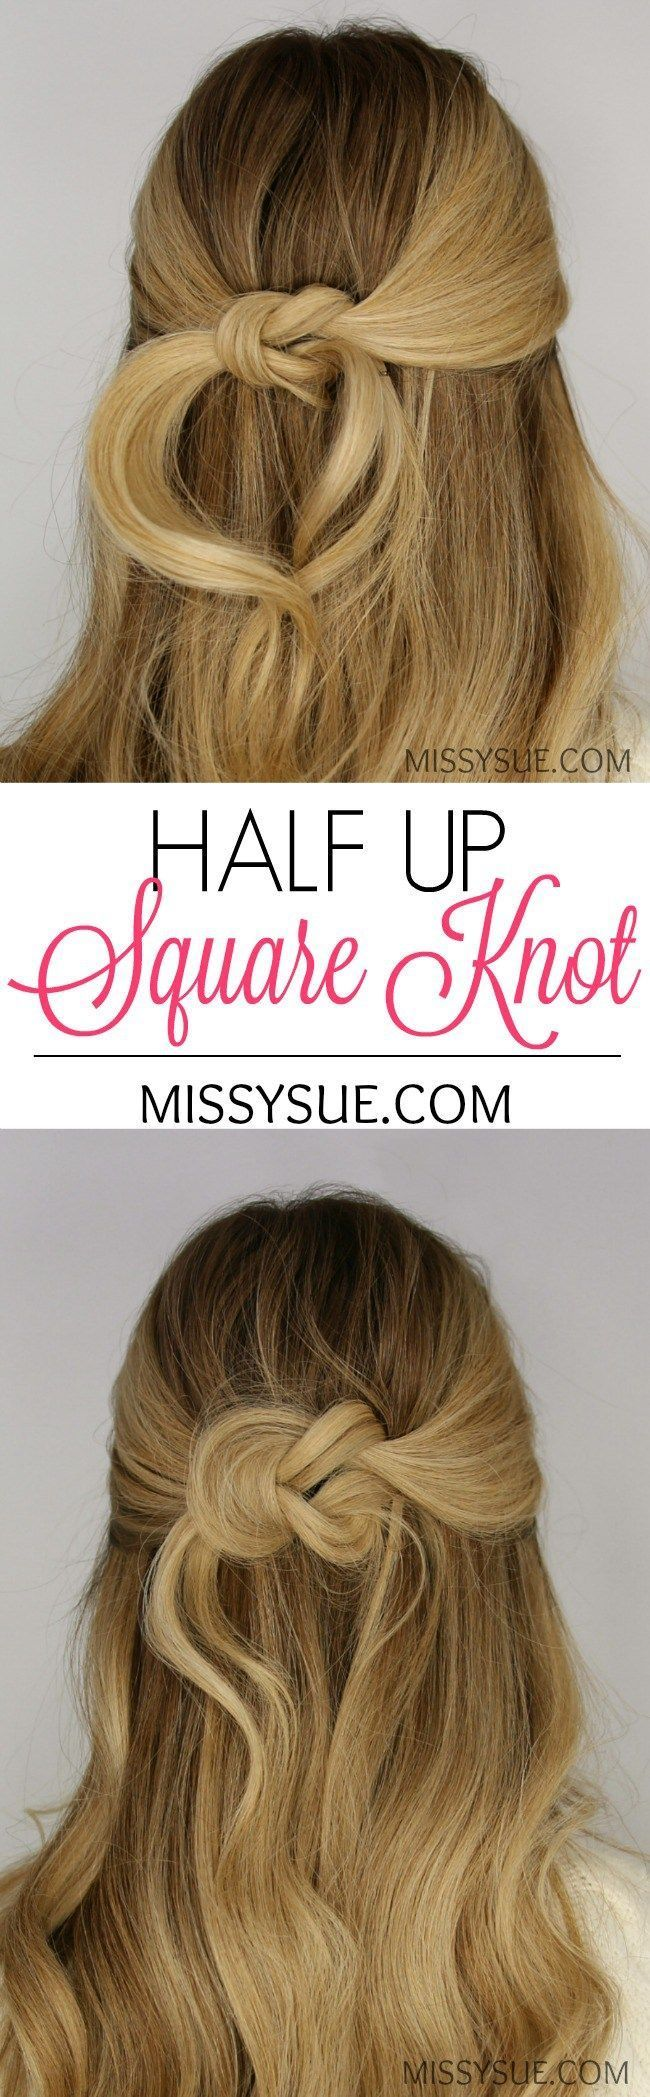 half up square knot - #square - #frisuren | frisuren